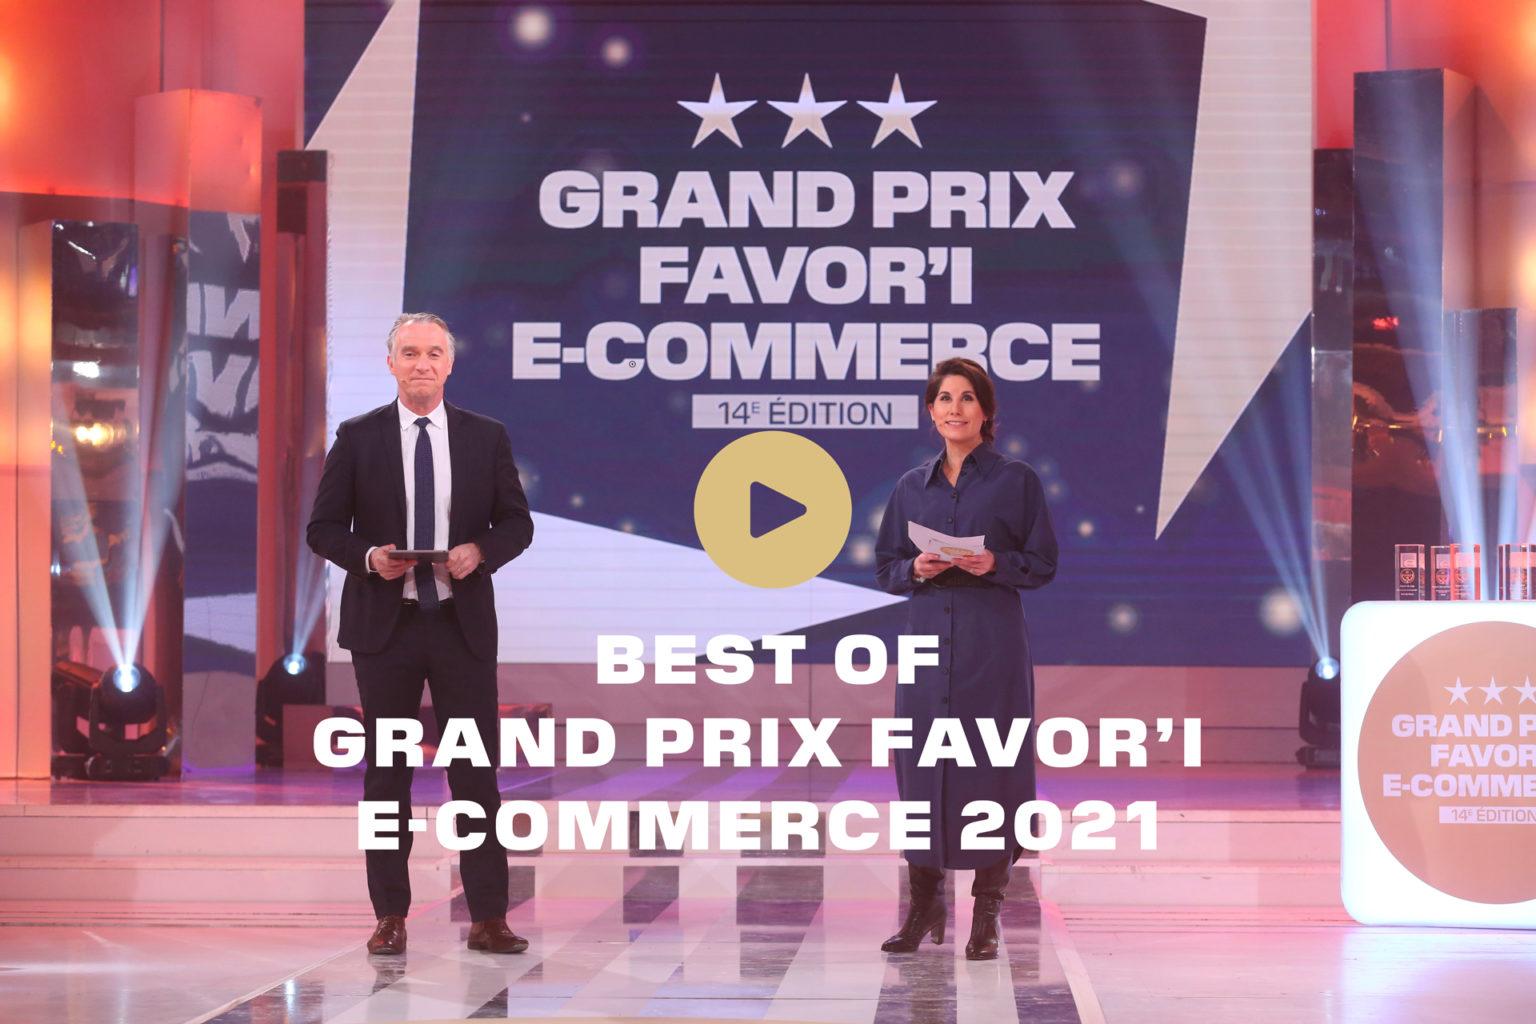 REPLAY : Grand Prix Favor'i E-commerce 2021